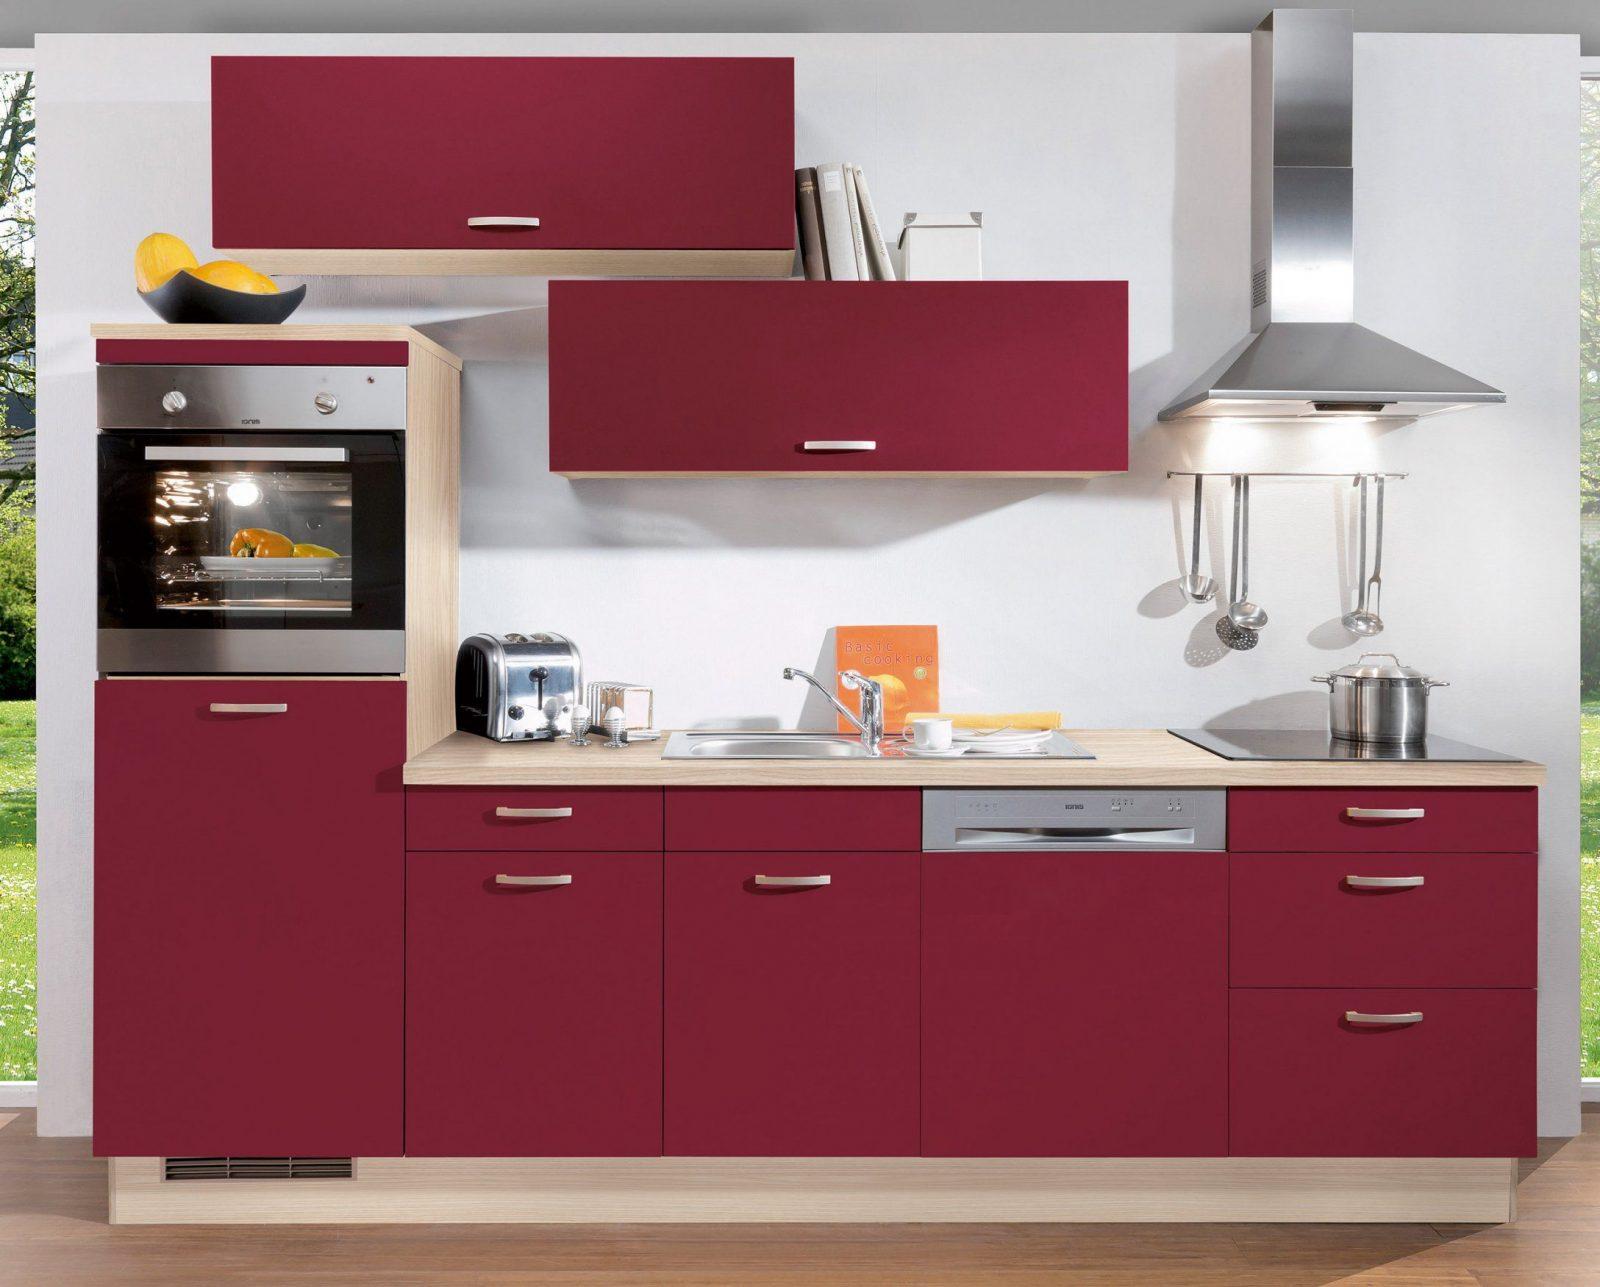 einbauk chen mit elektroger ten ikea haus design ideen. Black Bedroom Furniture Sets. Home Design Ideas